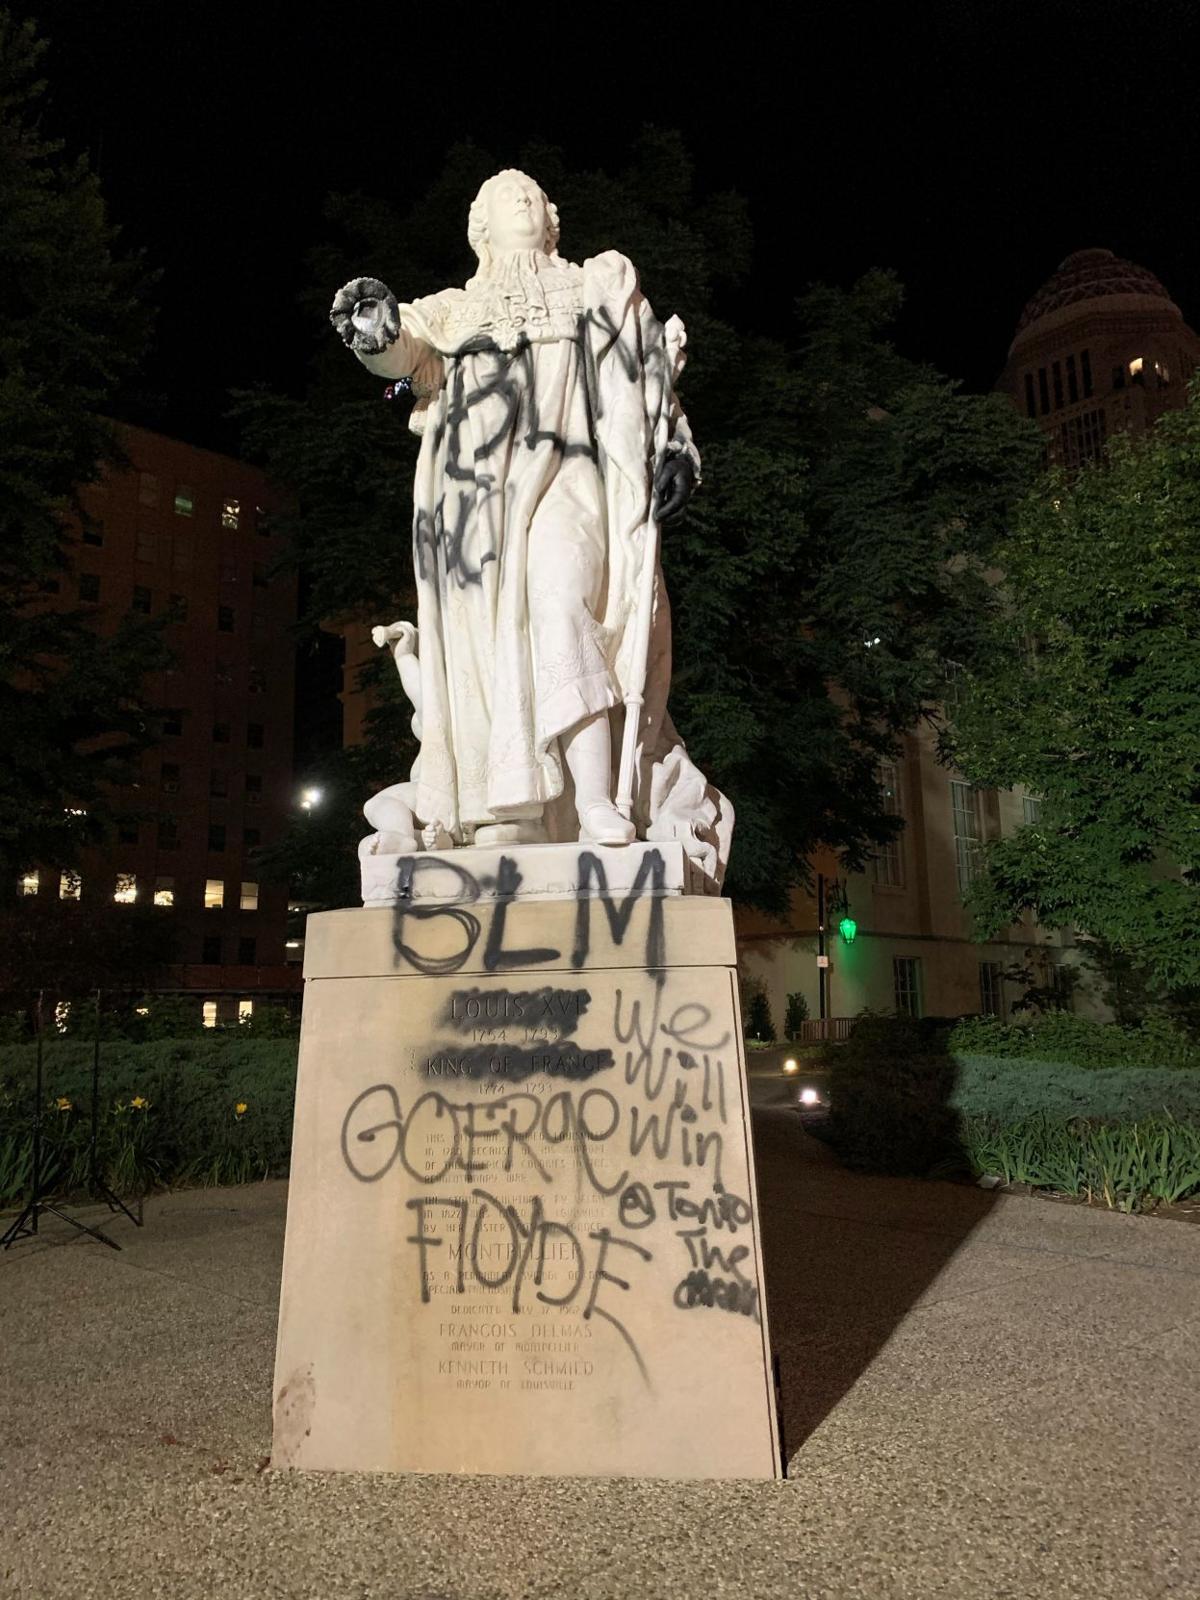 King Louis statue vandalized (June 12, 2020)